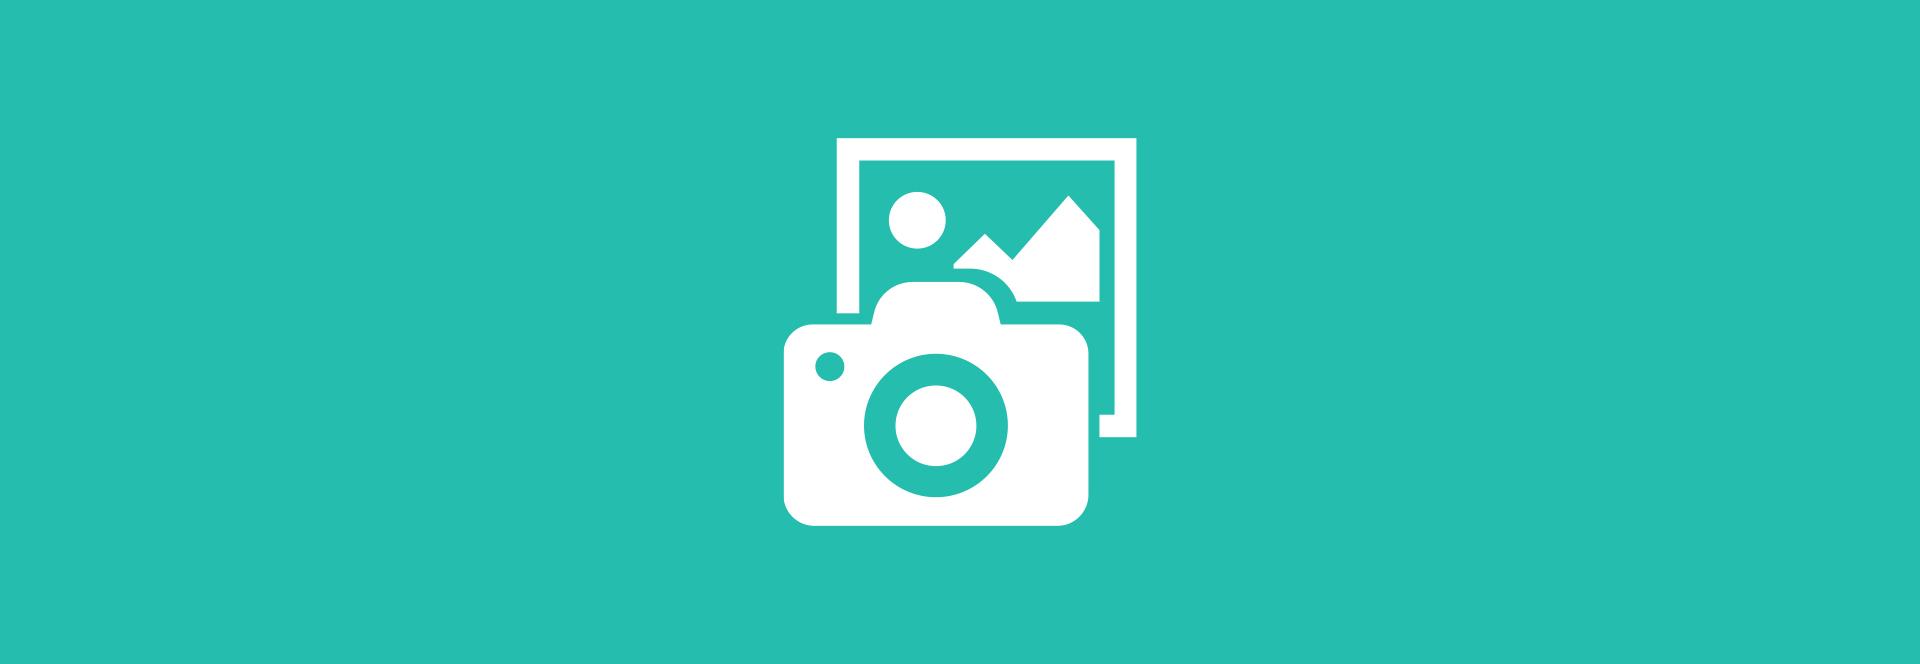 sydney design social camera image icon on aqua